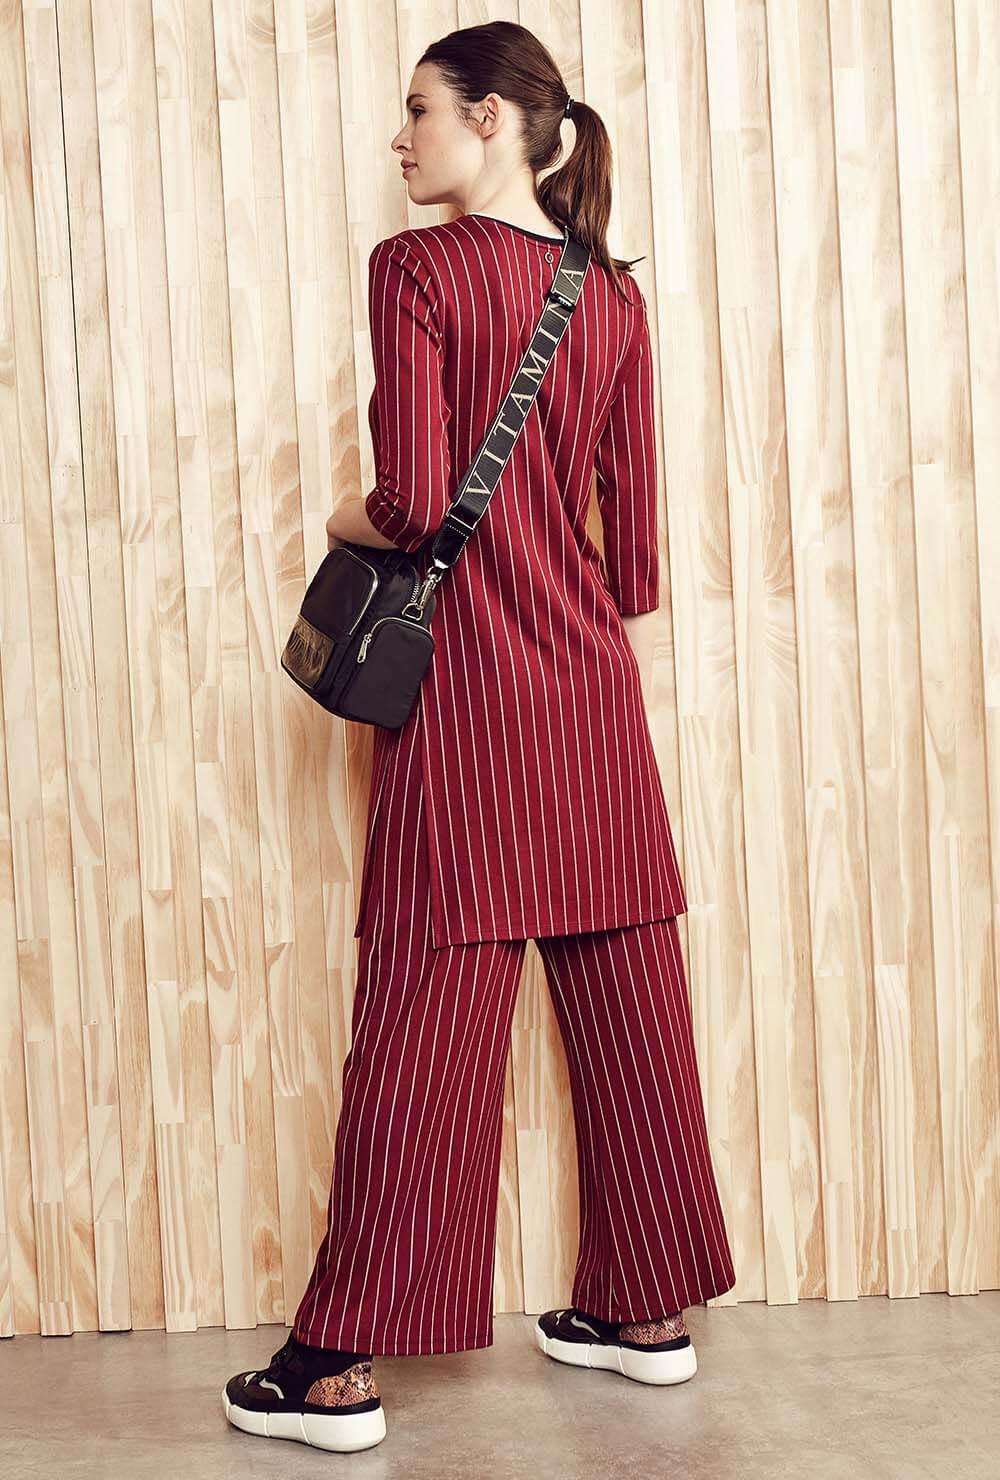 Moda casual con estilo deportivo invierno 2020. Moda ropa de mujer invierno 2020.